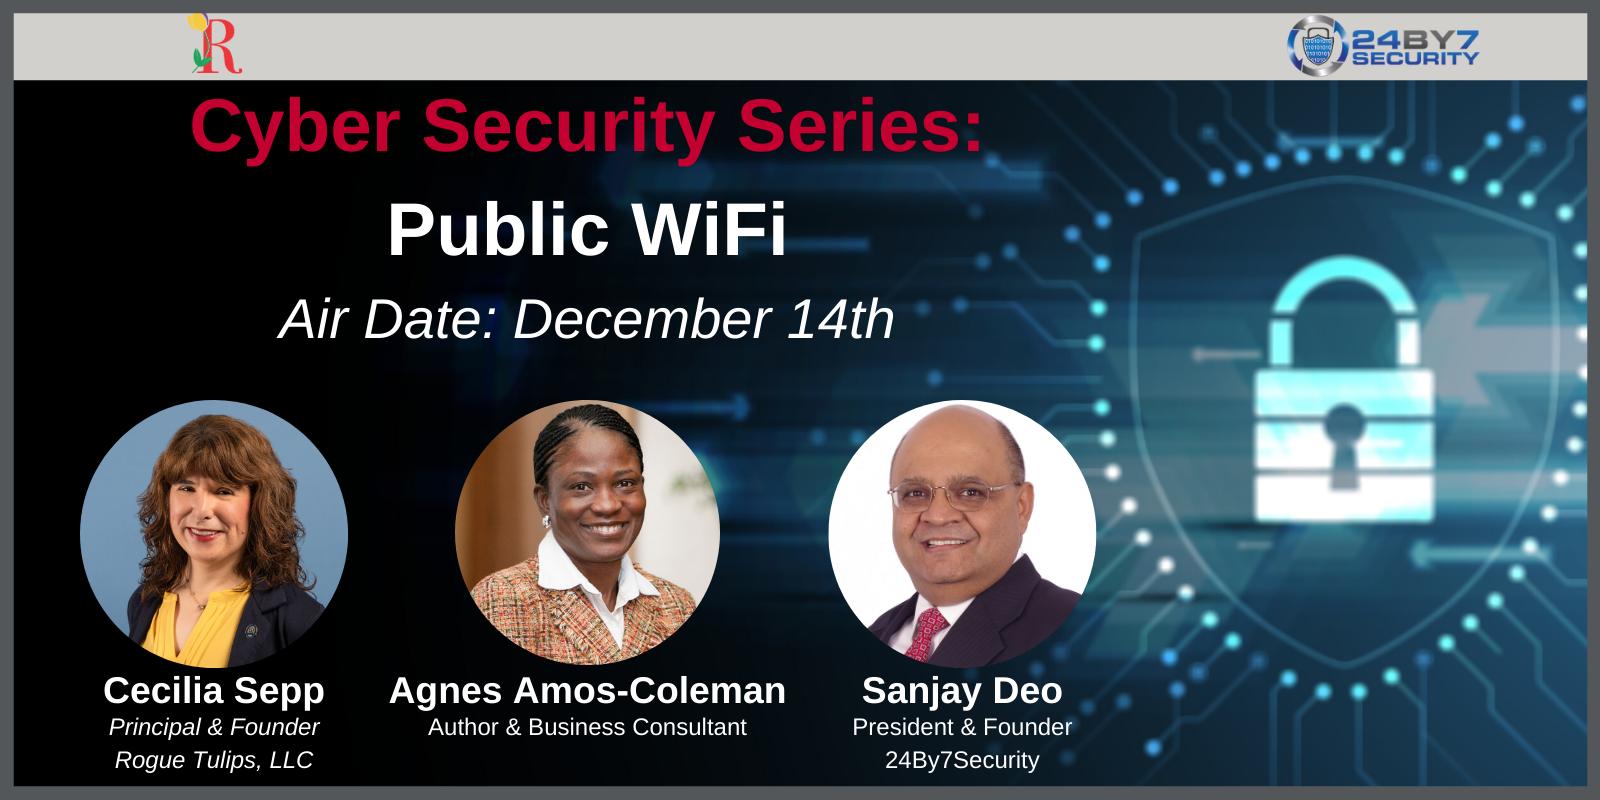 Cybersecurity Series Public WiFi